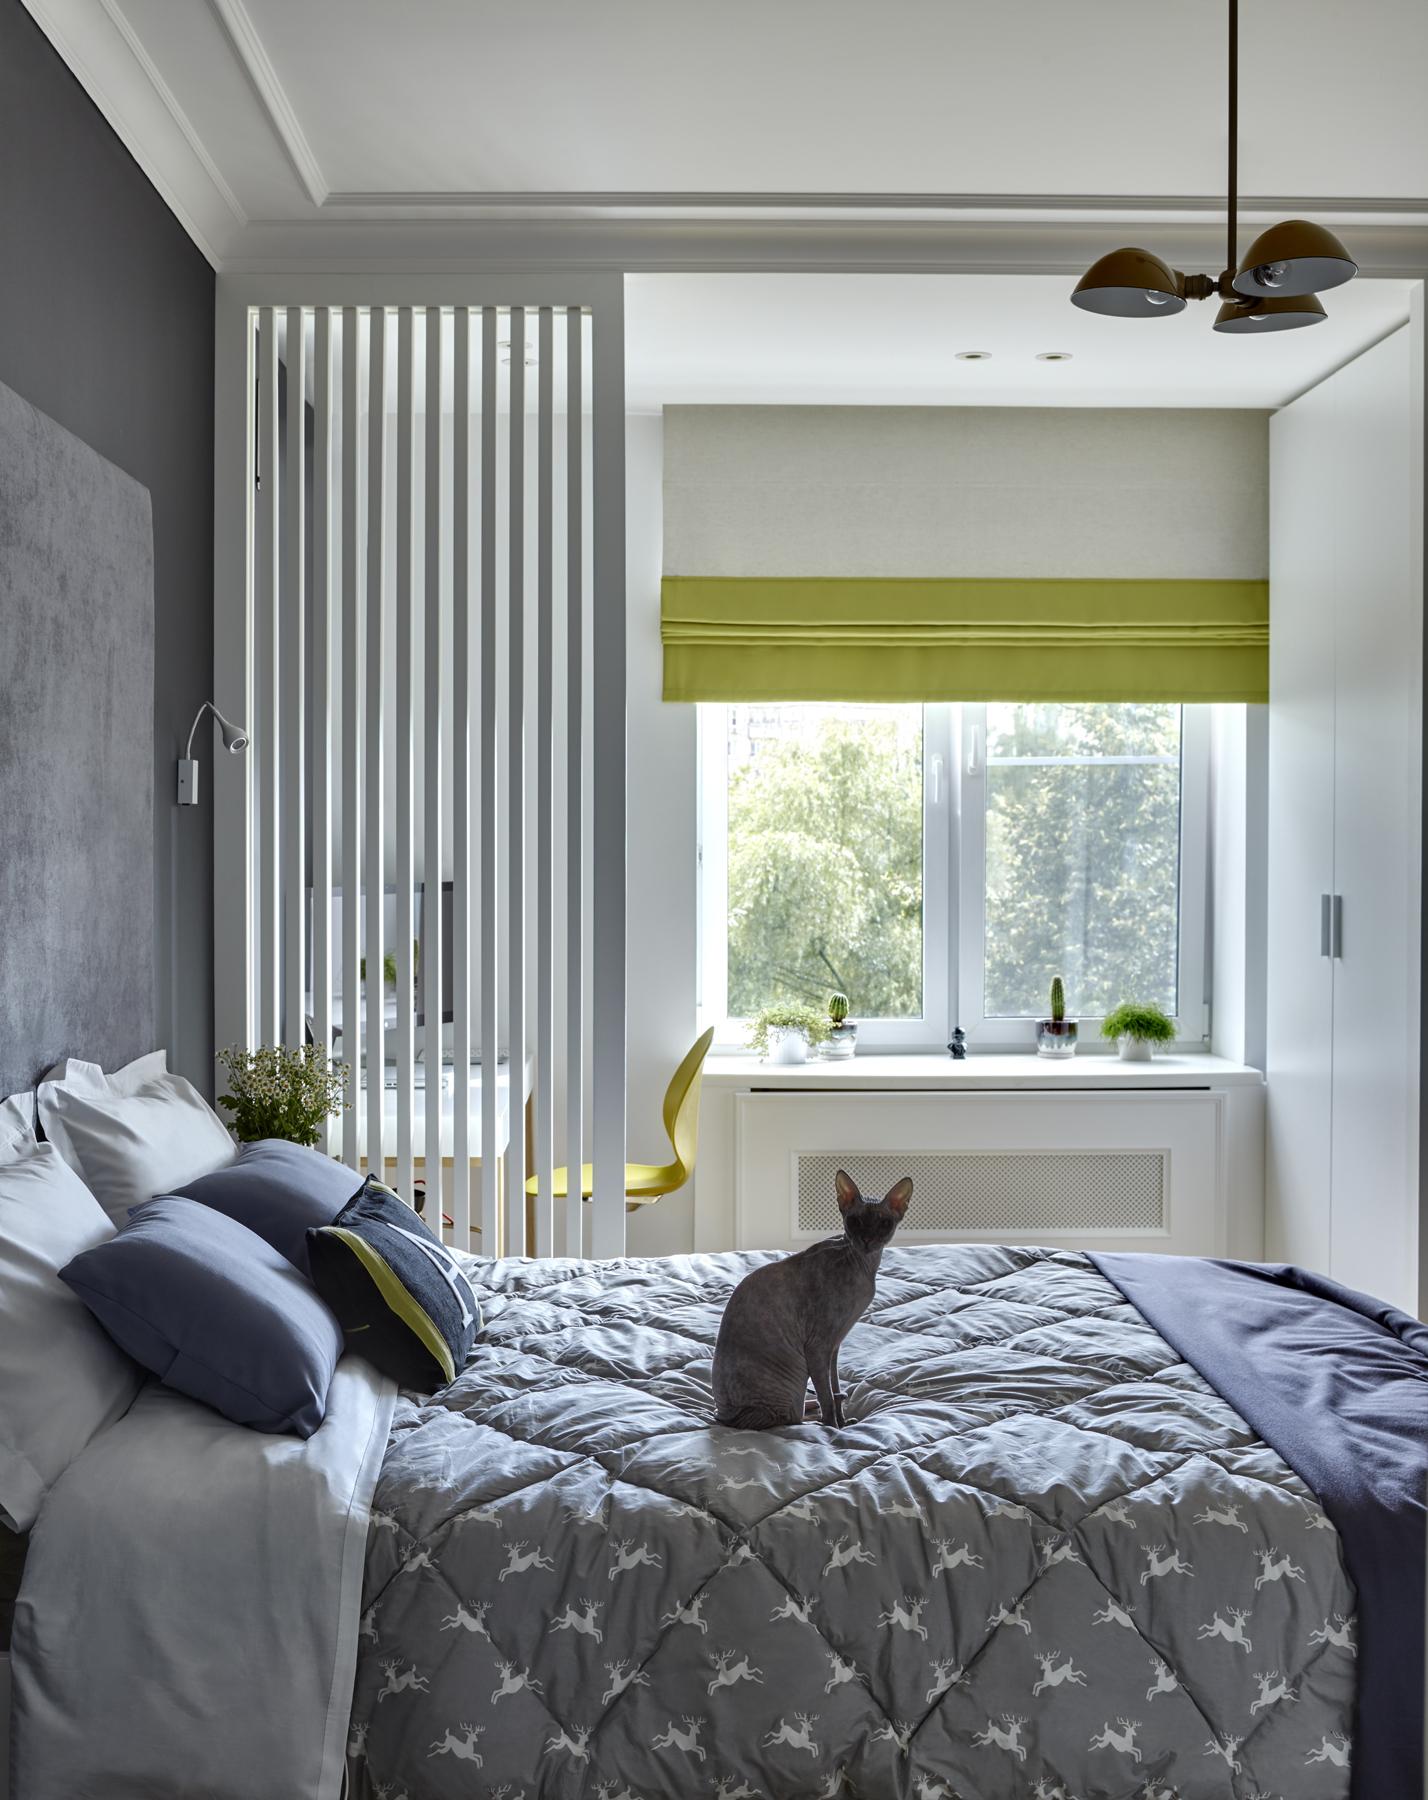 pat Scandinavian bedroom ideas that will inspire you to remodel